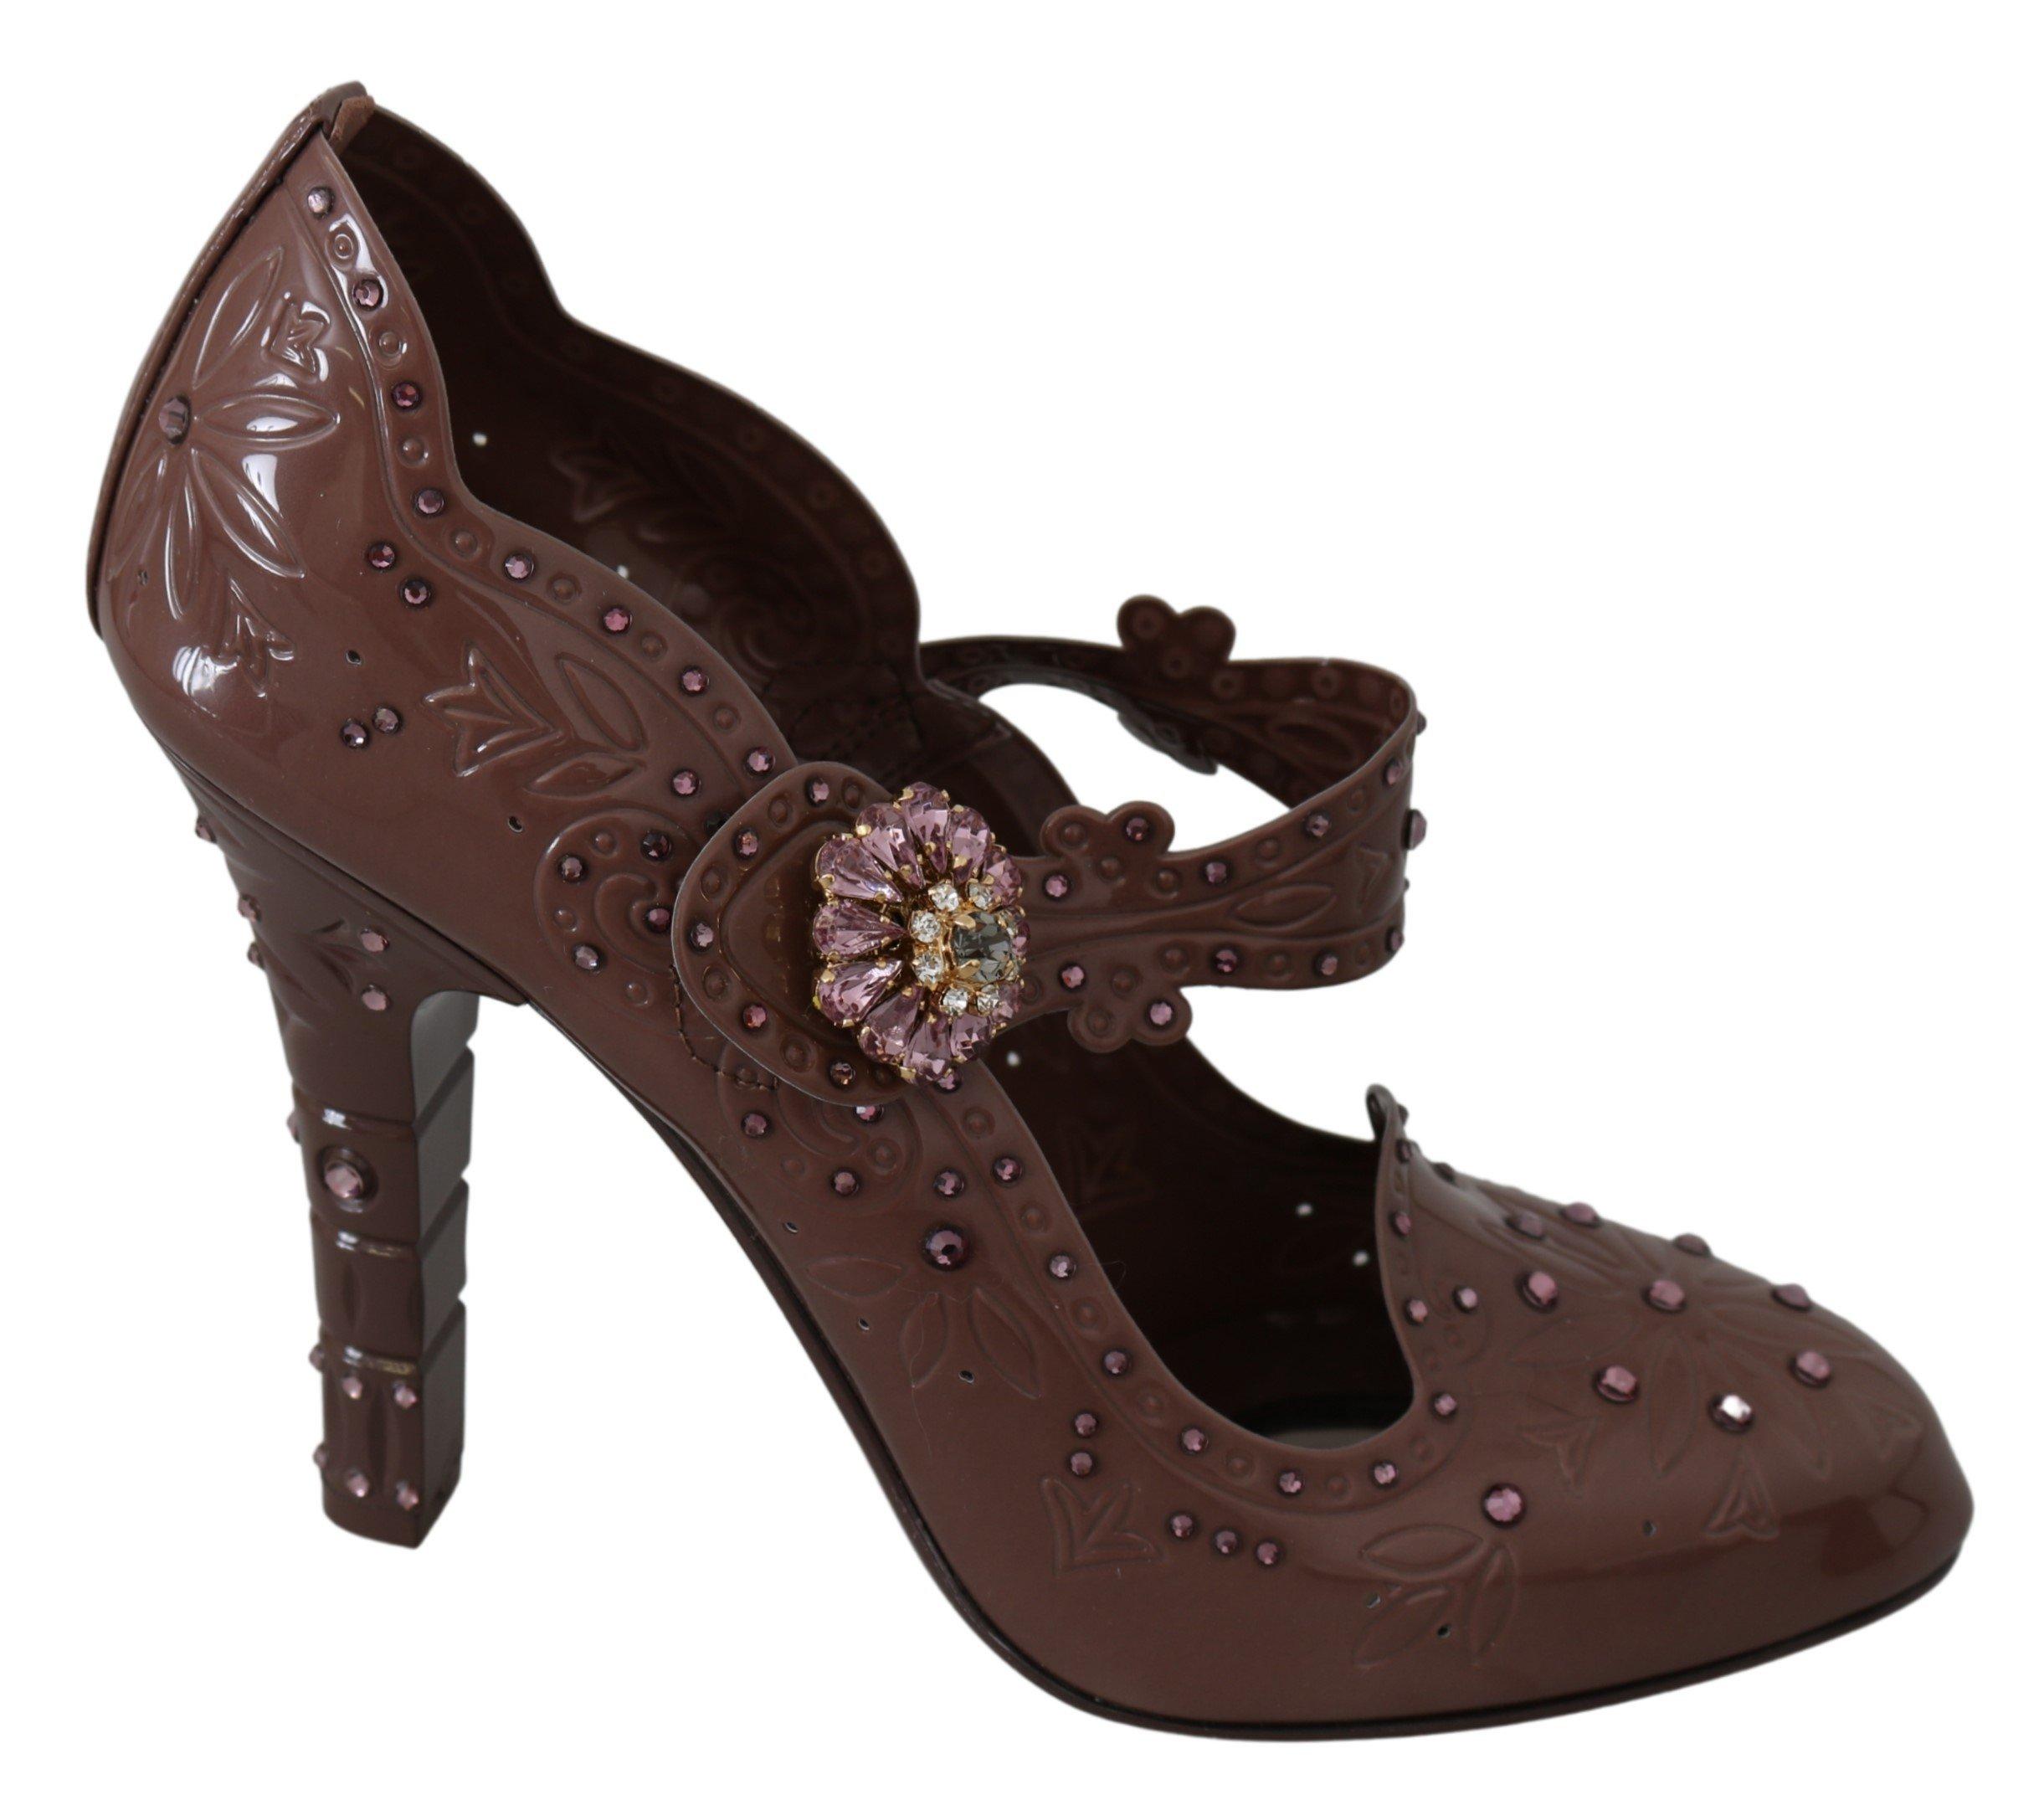 Dolce & Gabbana Women's Floral Crystal CINDERELLA Pumps Brown LA7288 - EU40/US9.5